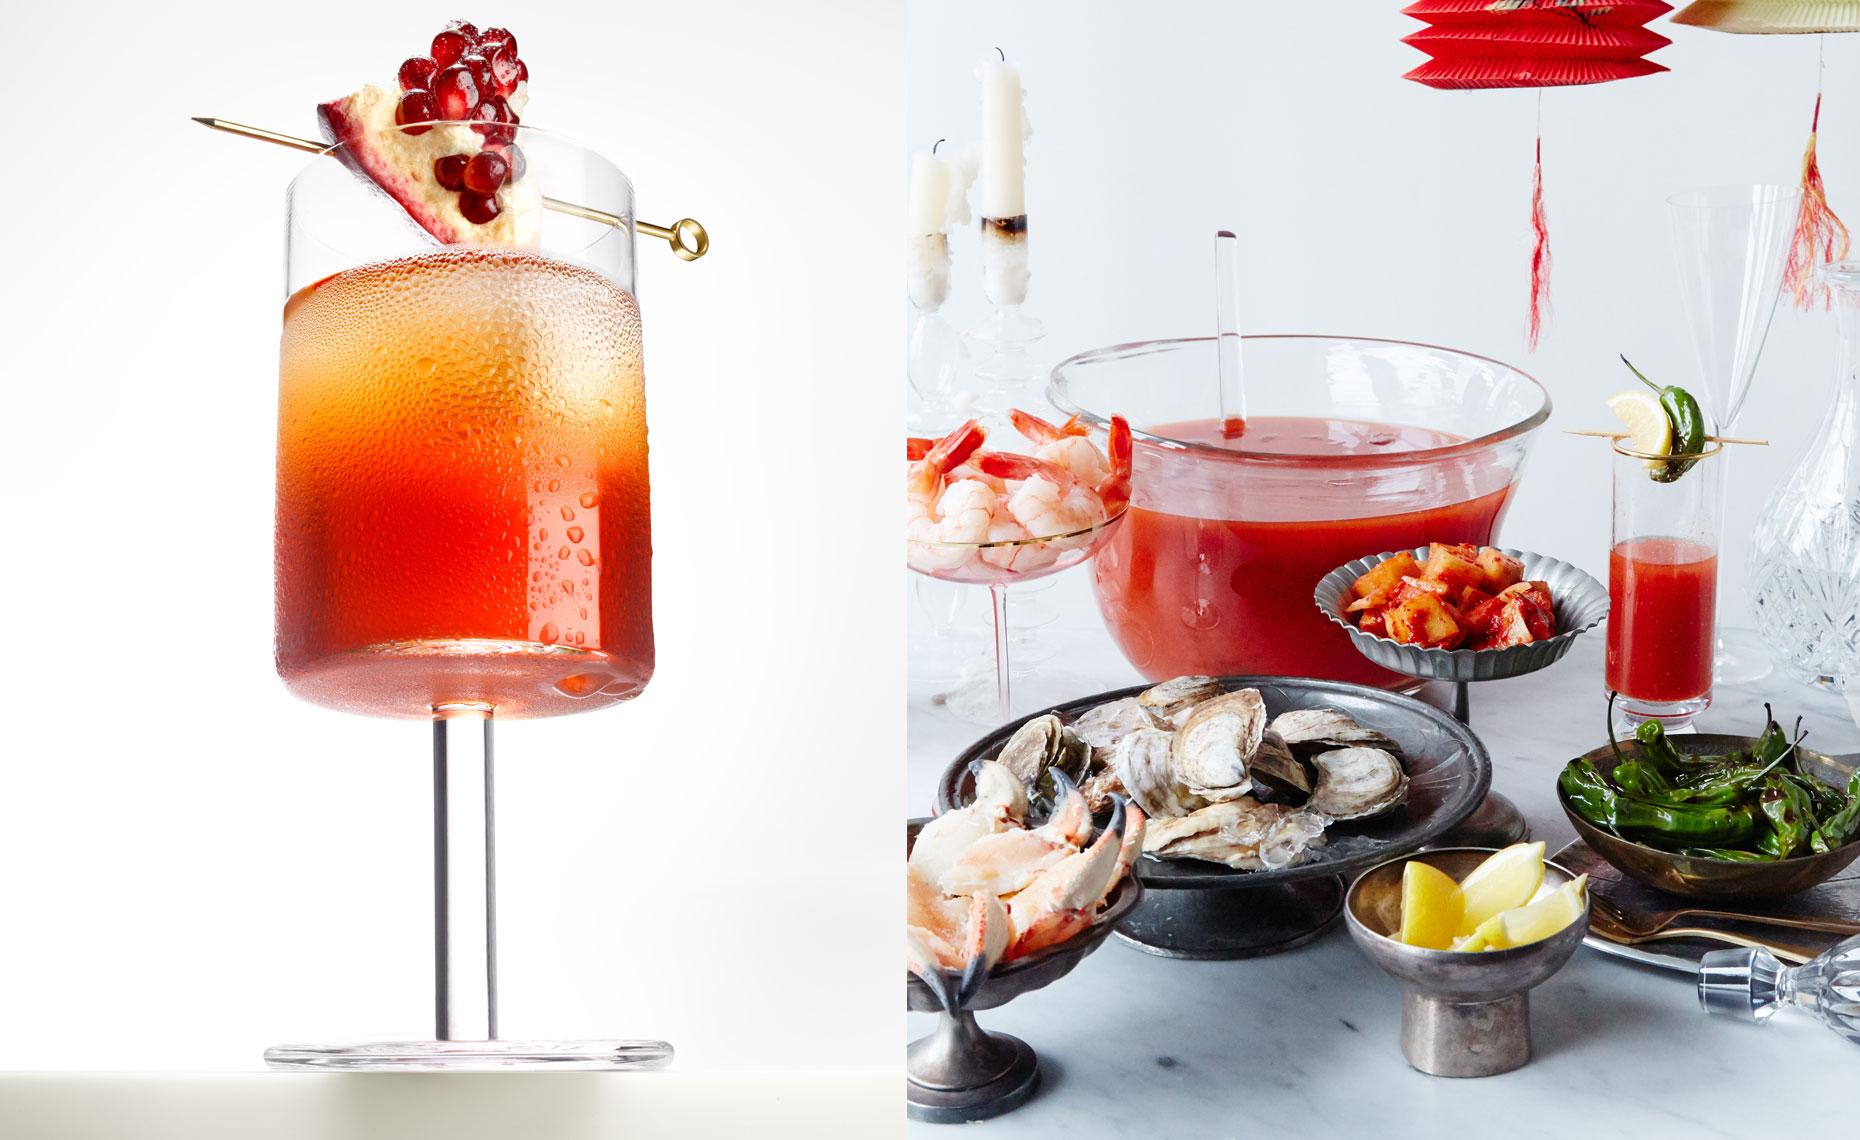 pomegranate-and-shrimp.jpg